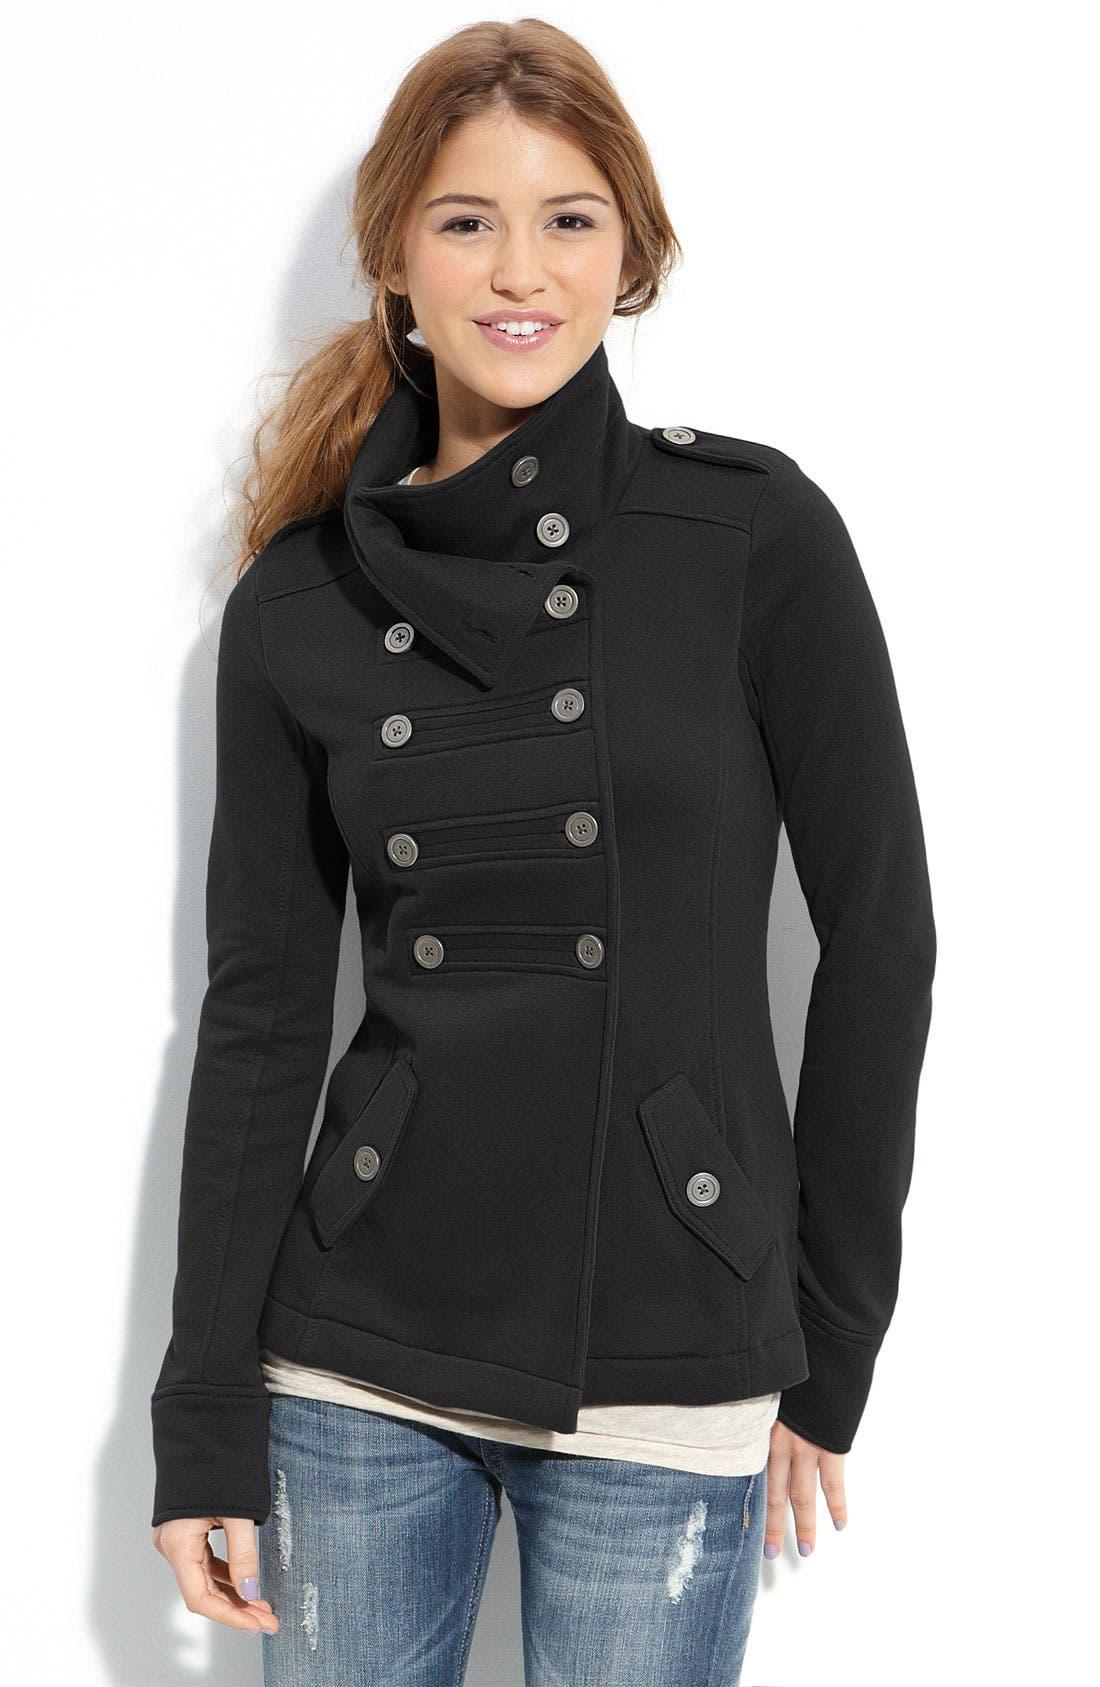 Rubbish Military Knit Jacket,                         Main,                         color, 001